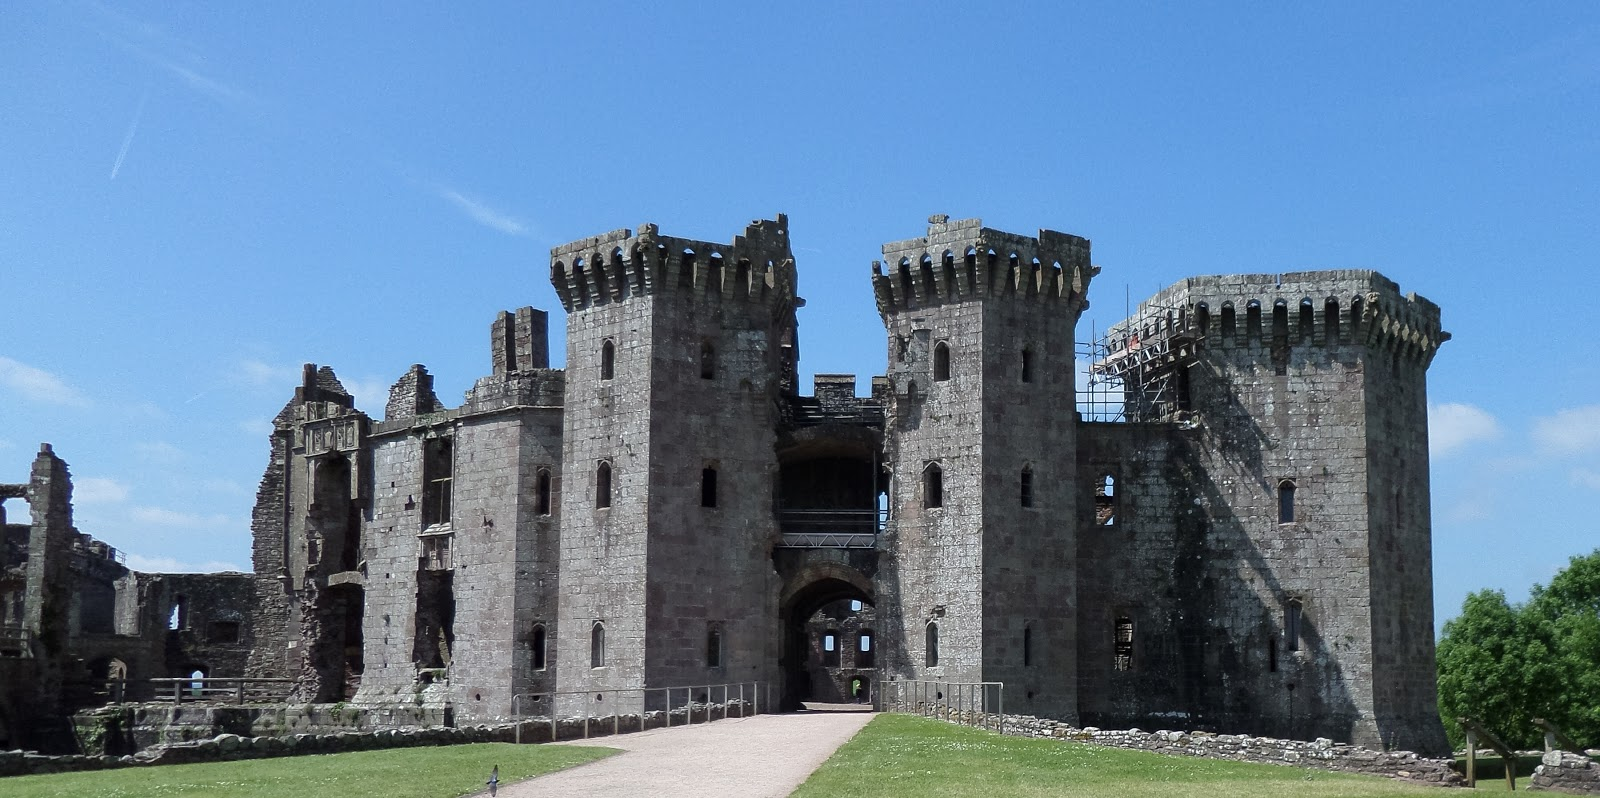 raglan castle - Transitional Castle 2016